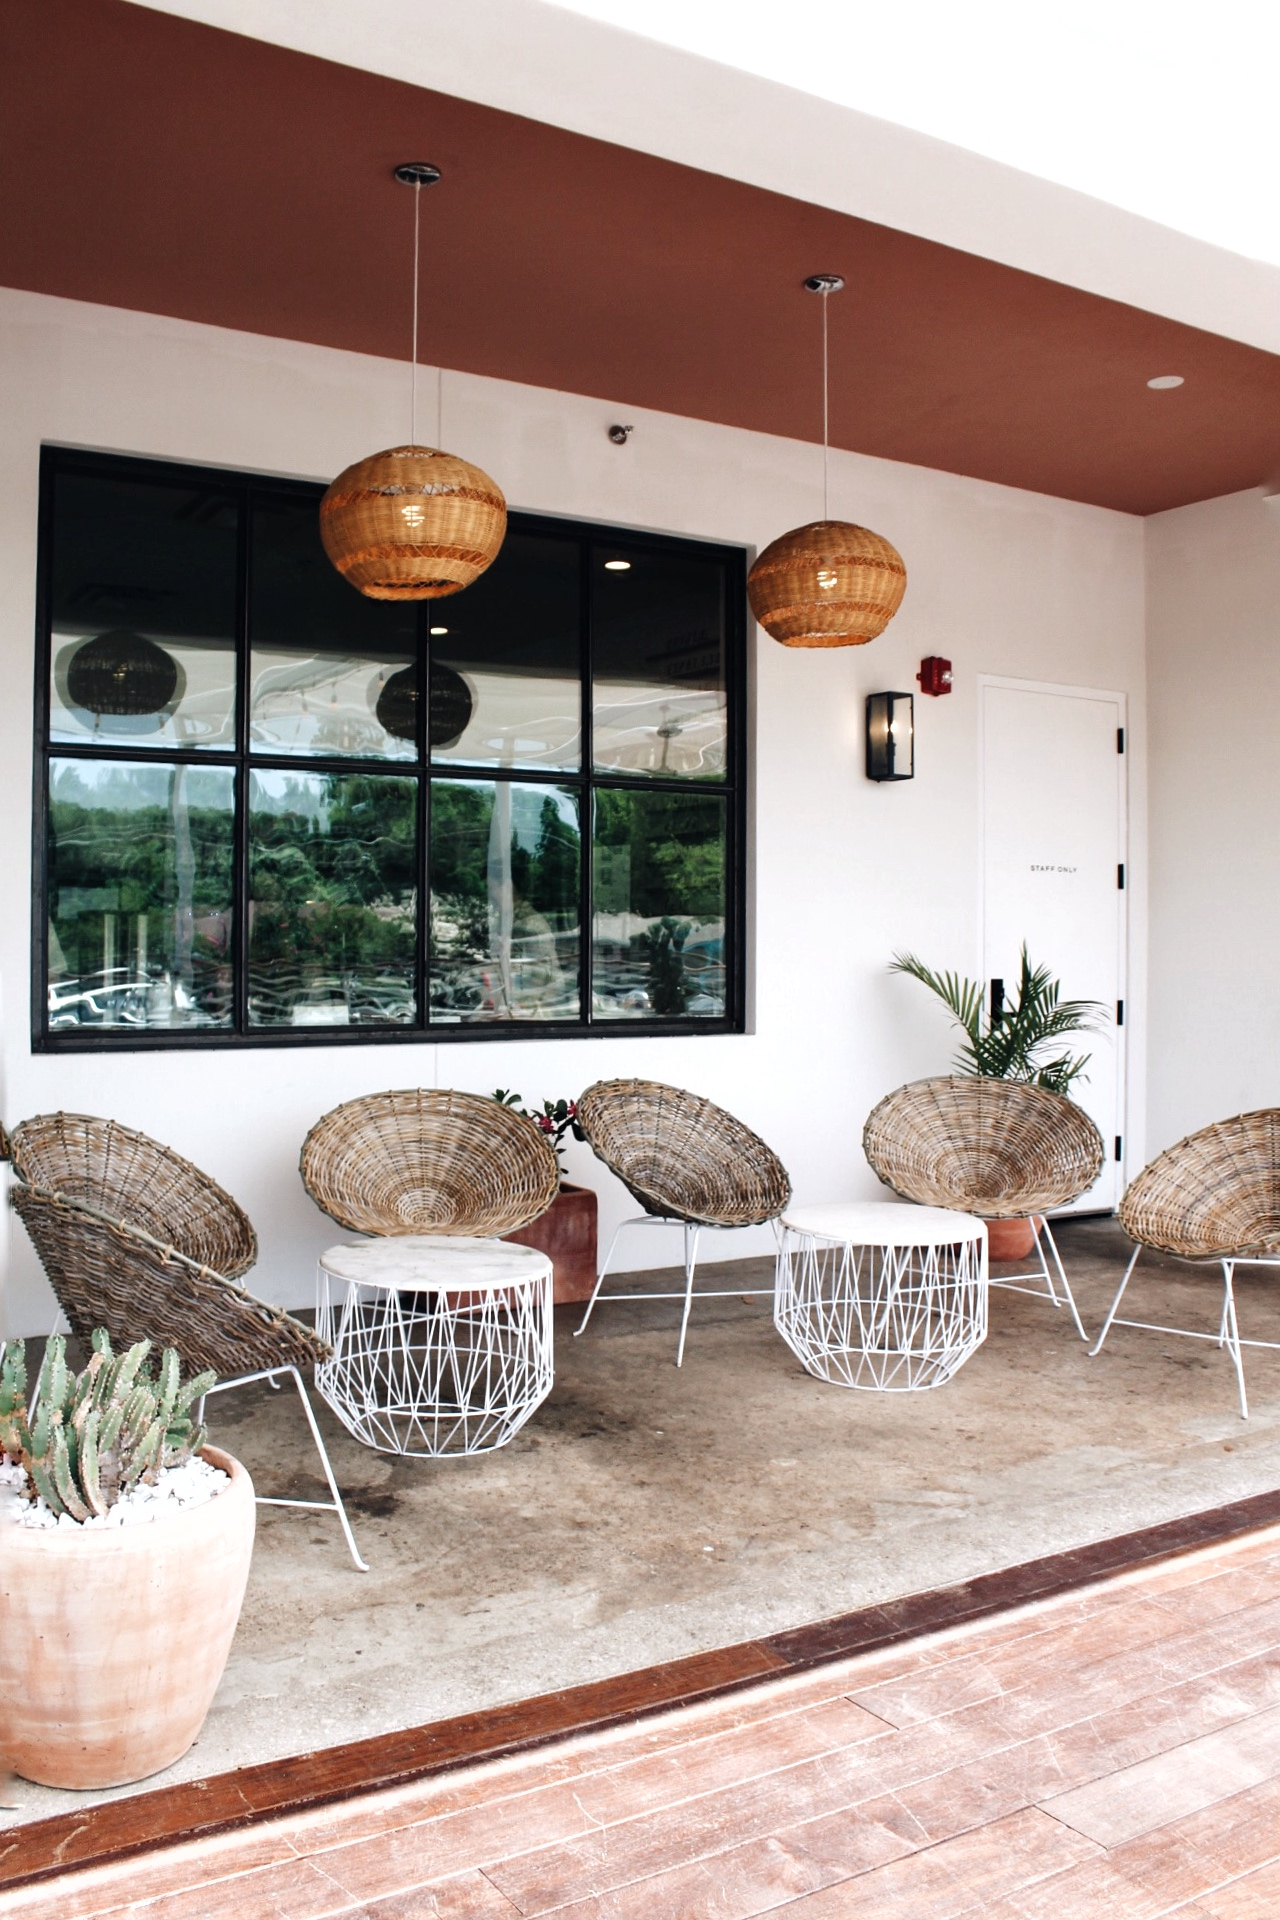 Most Instagrammable Restaurants in Austin - Hanks - www.tresgigi.com